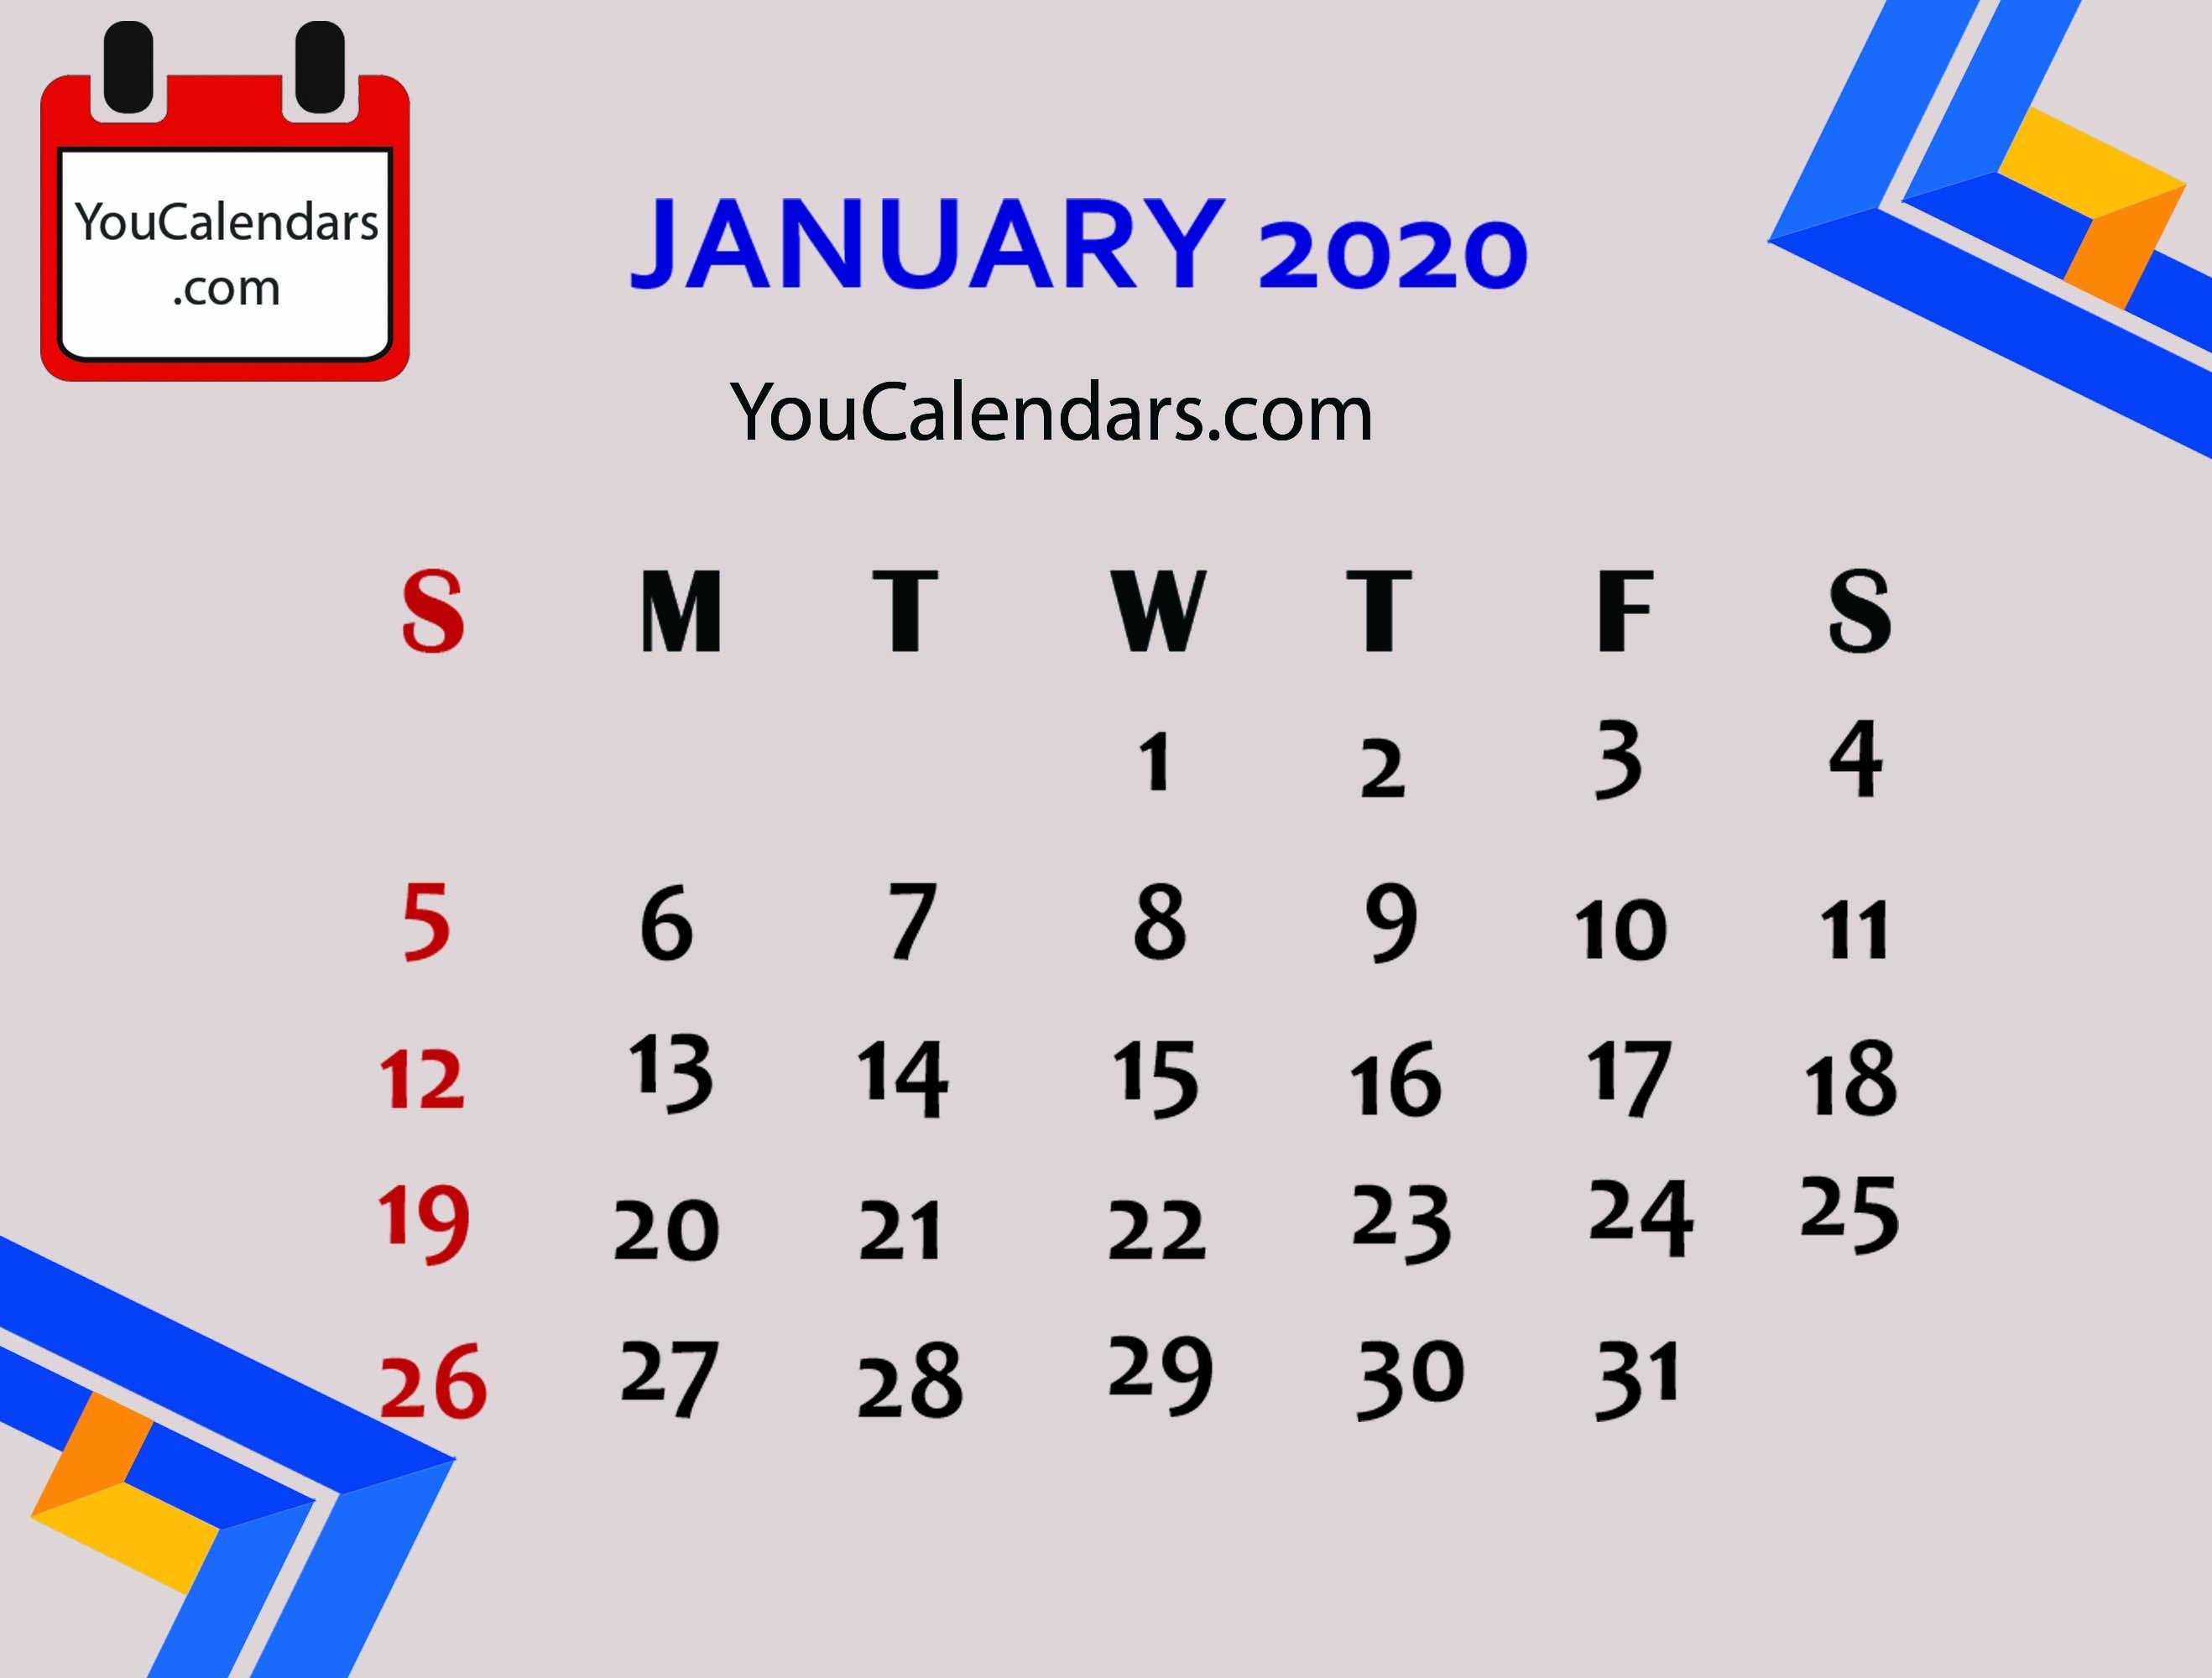 ✅Free January 2020 Calendar Printable Template - You Calendars